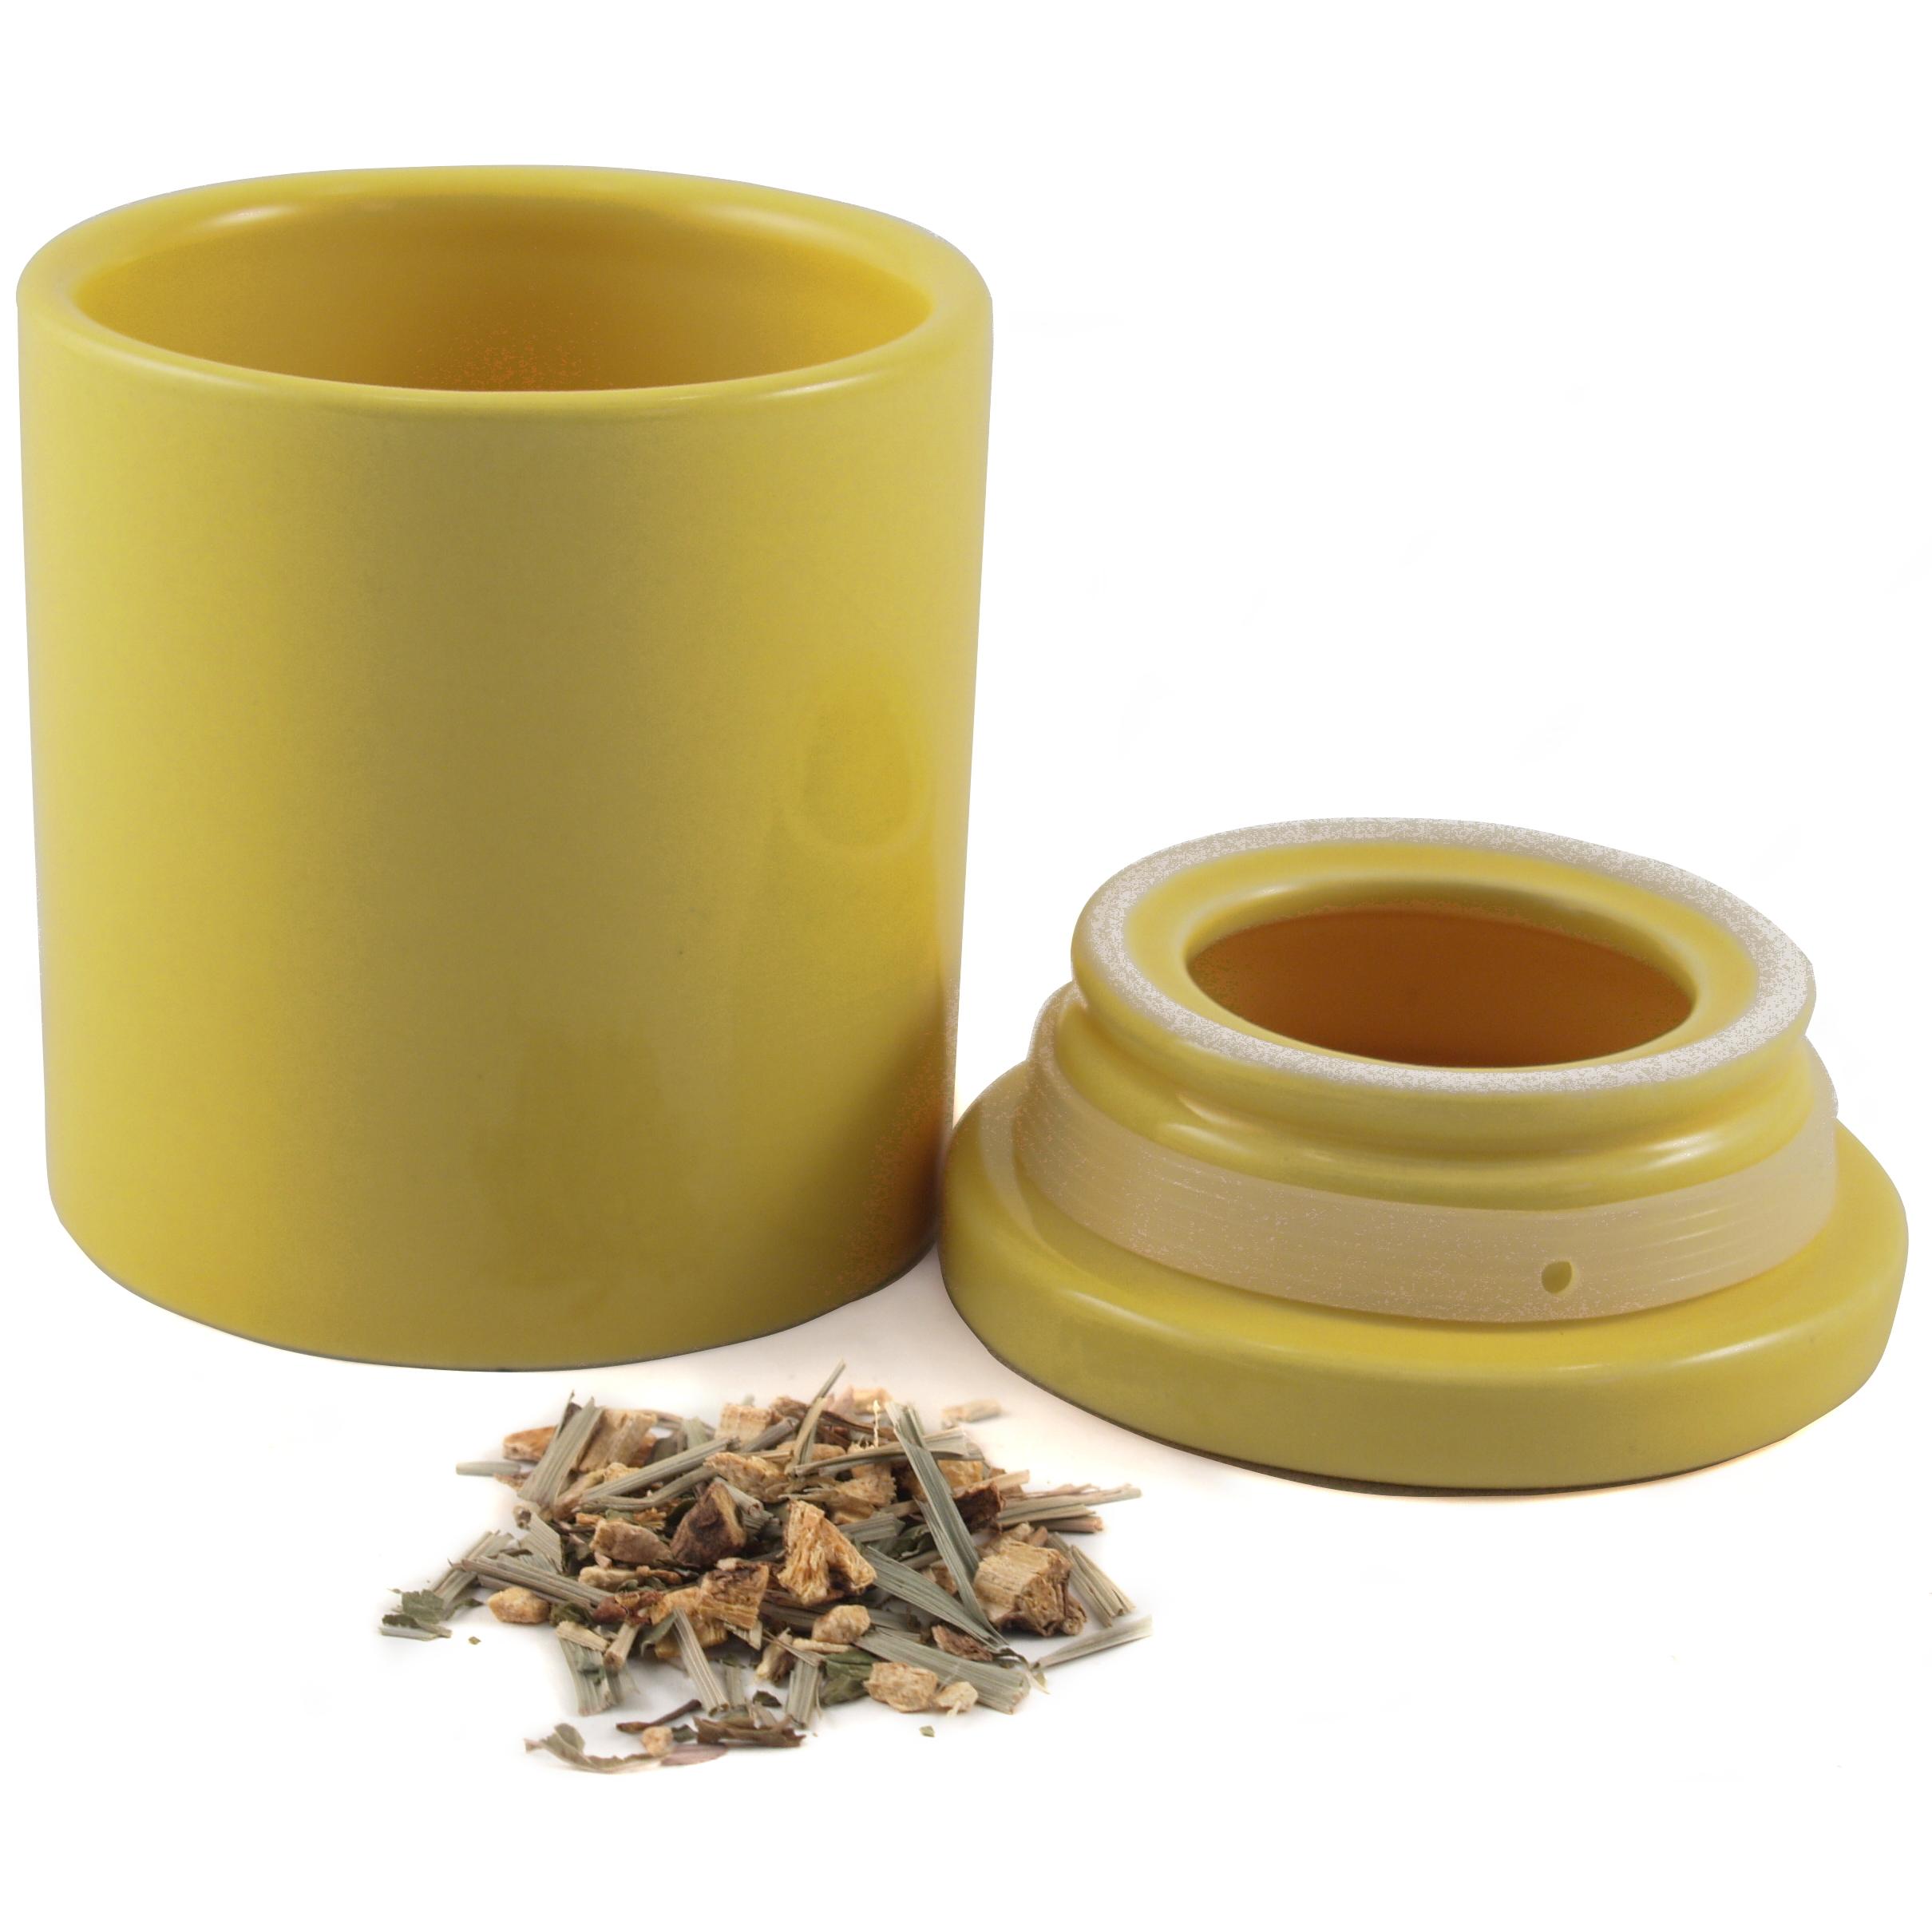 Yellow Ceramic Airtight Tea Canister